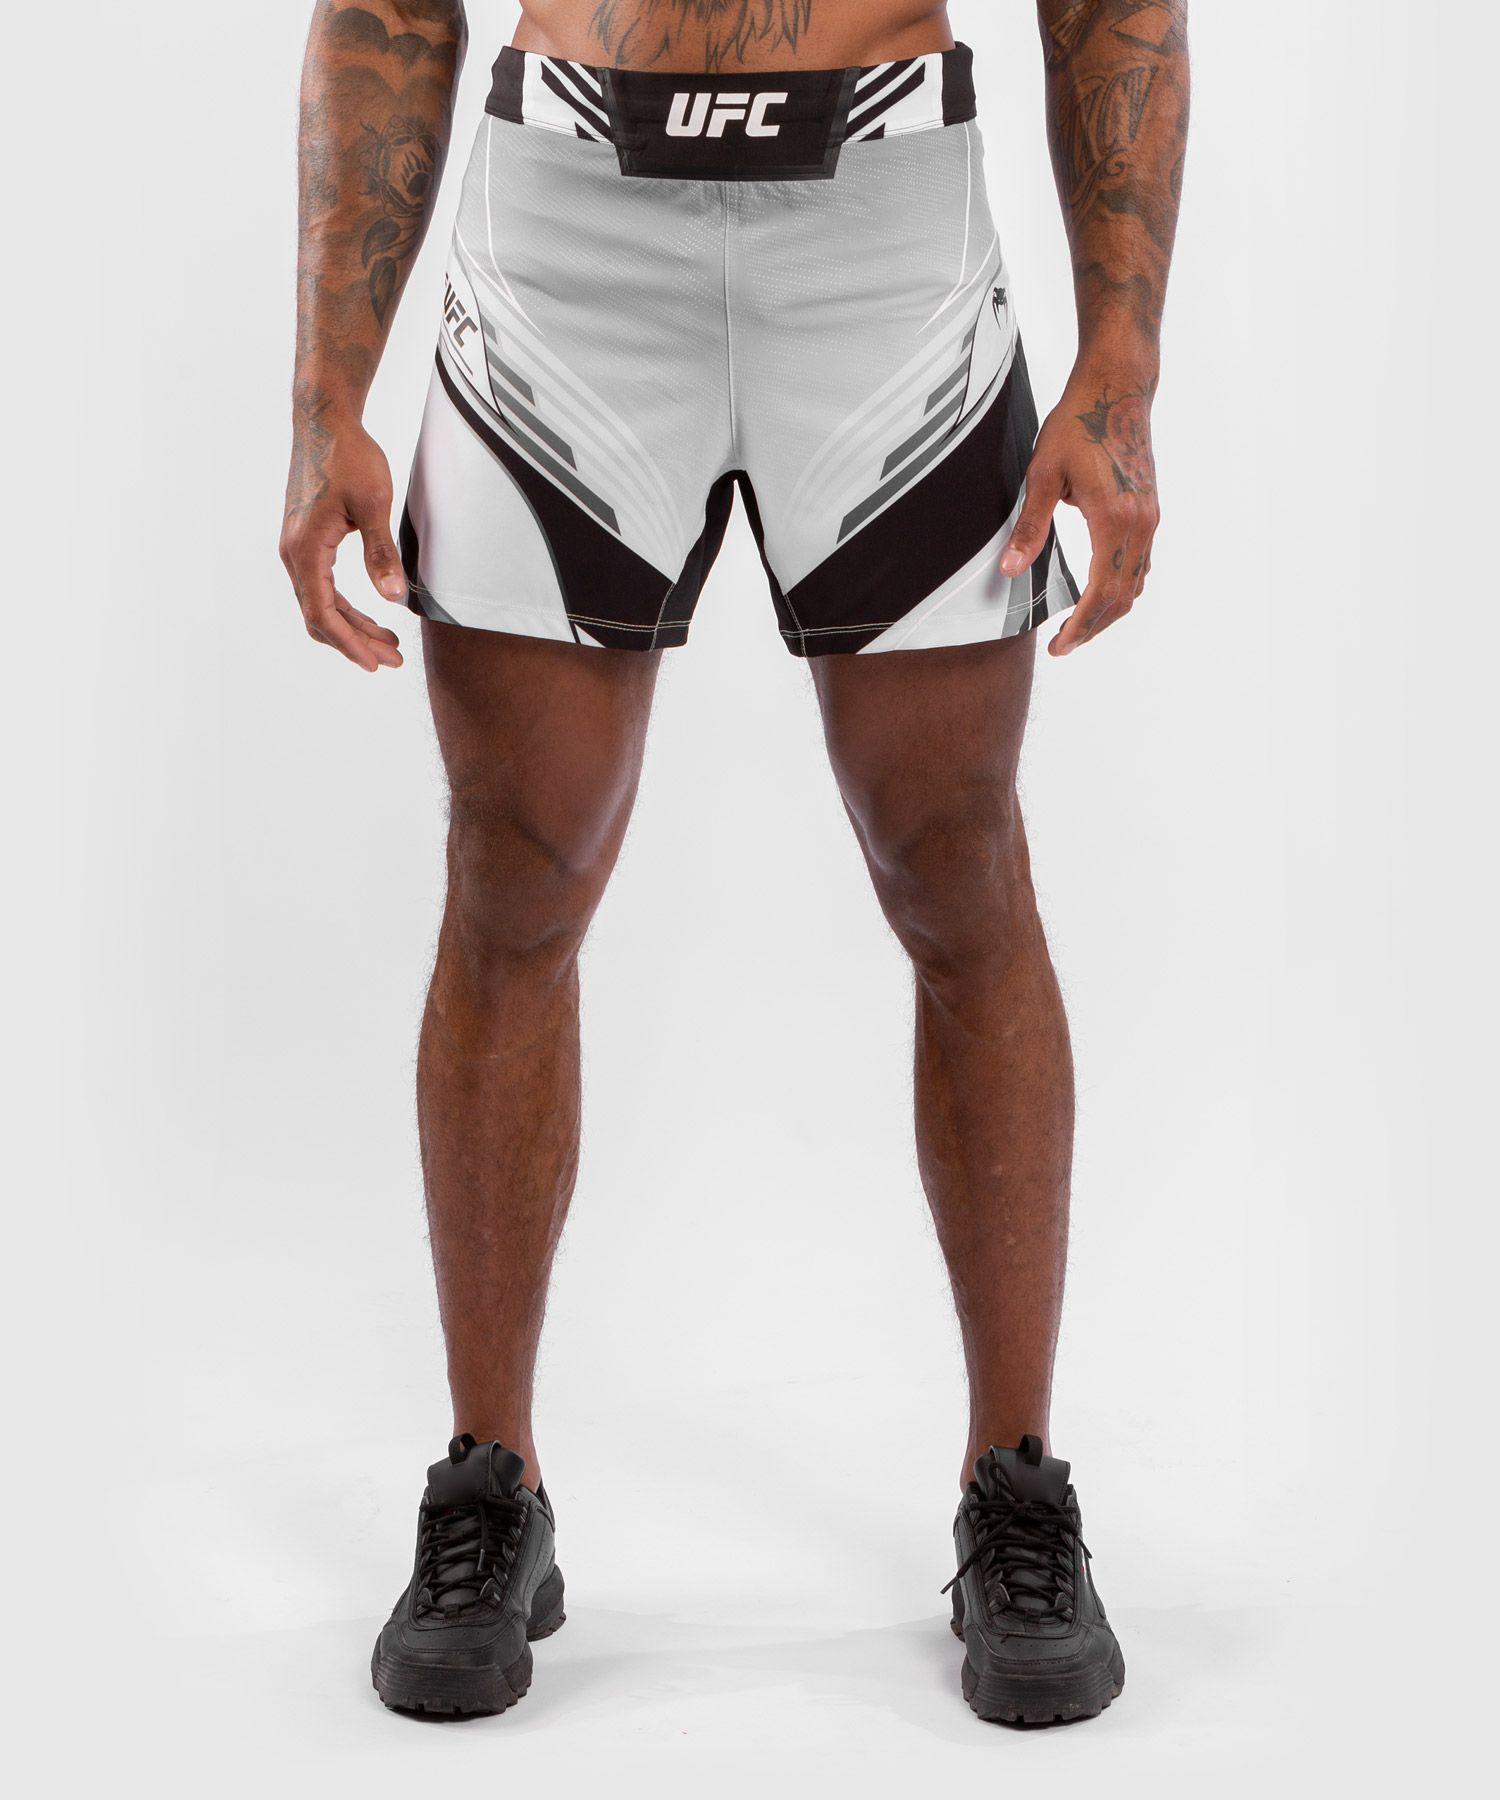 Pantalón De MMA Para Hombre UFC Venum Authentic Fight Night – Modelo Corto - Blanco